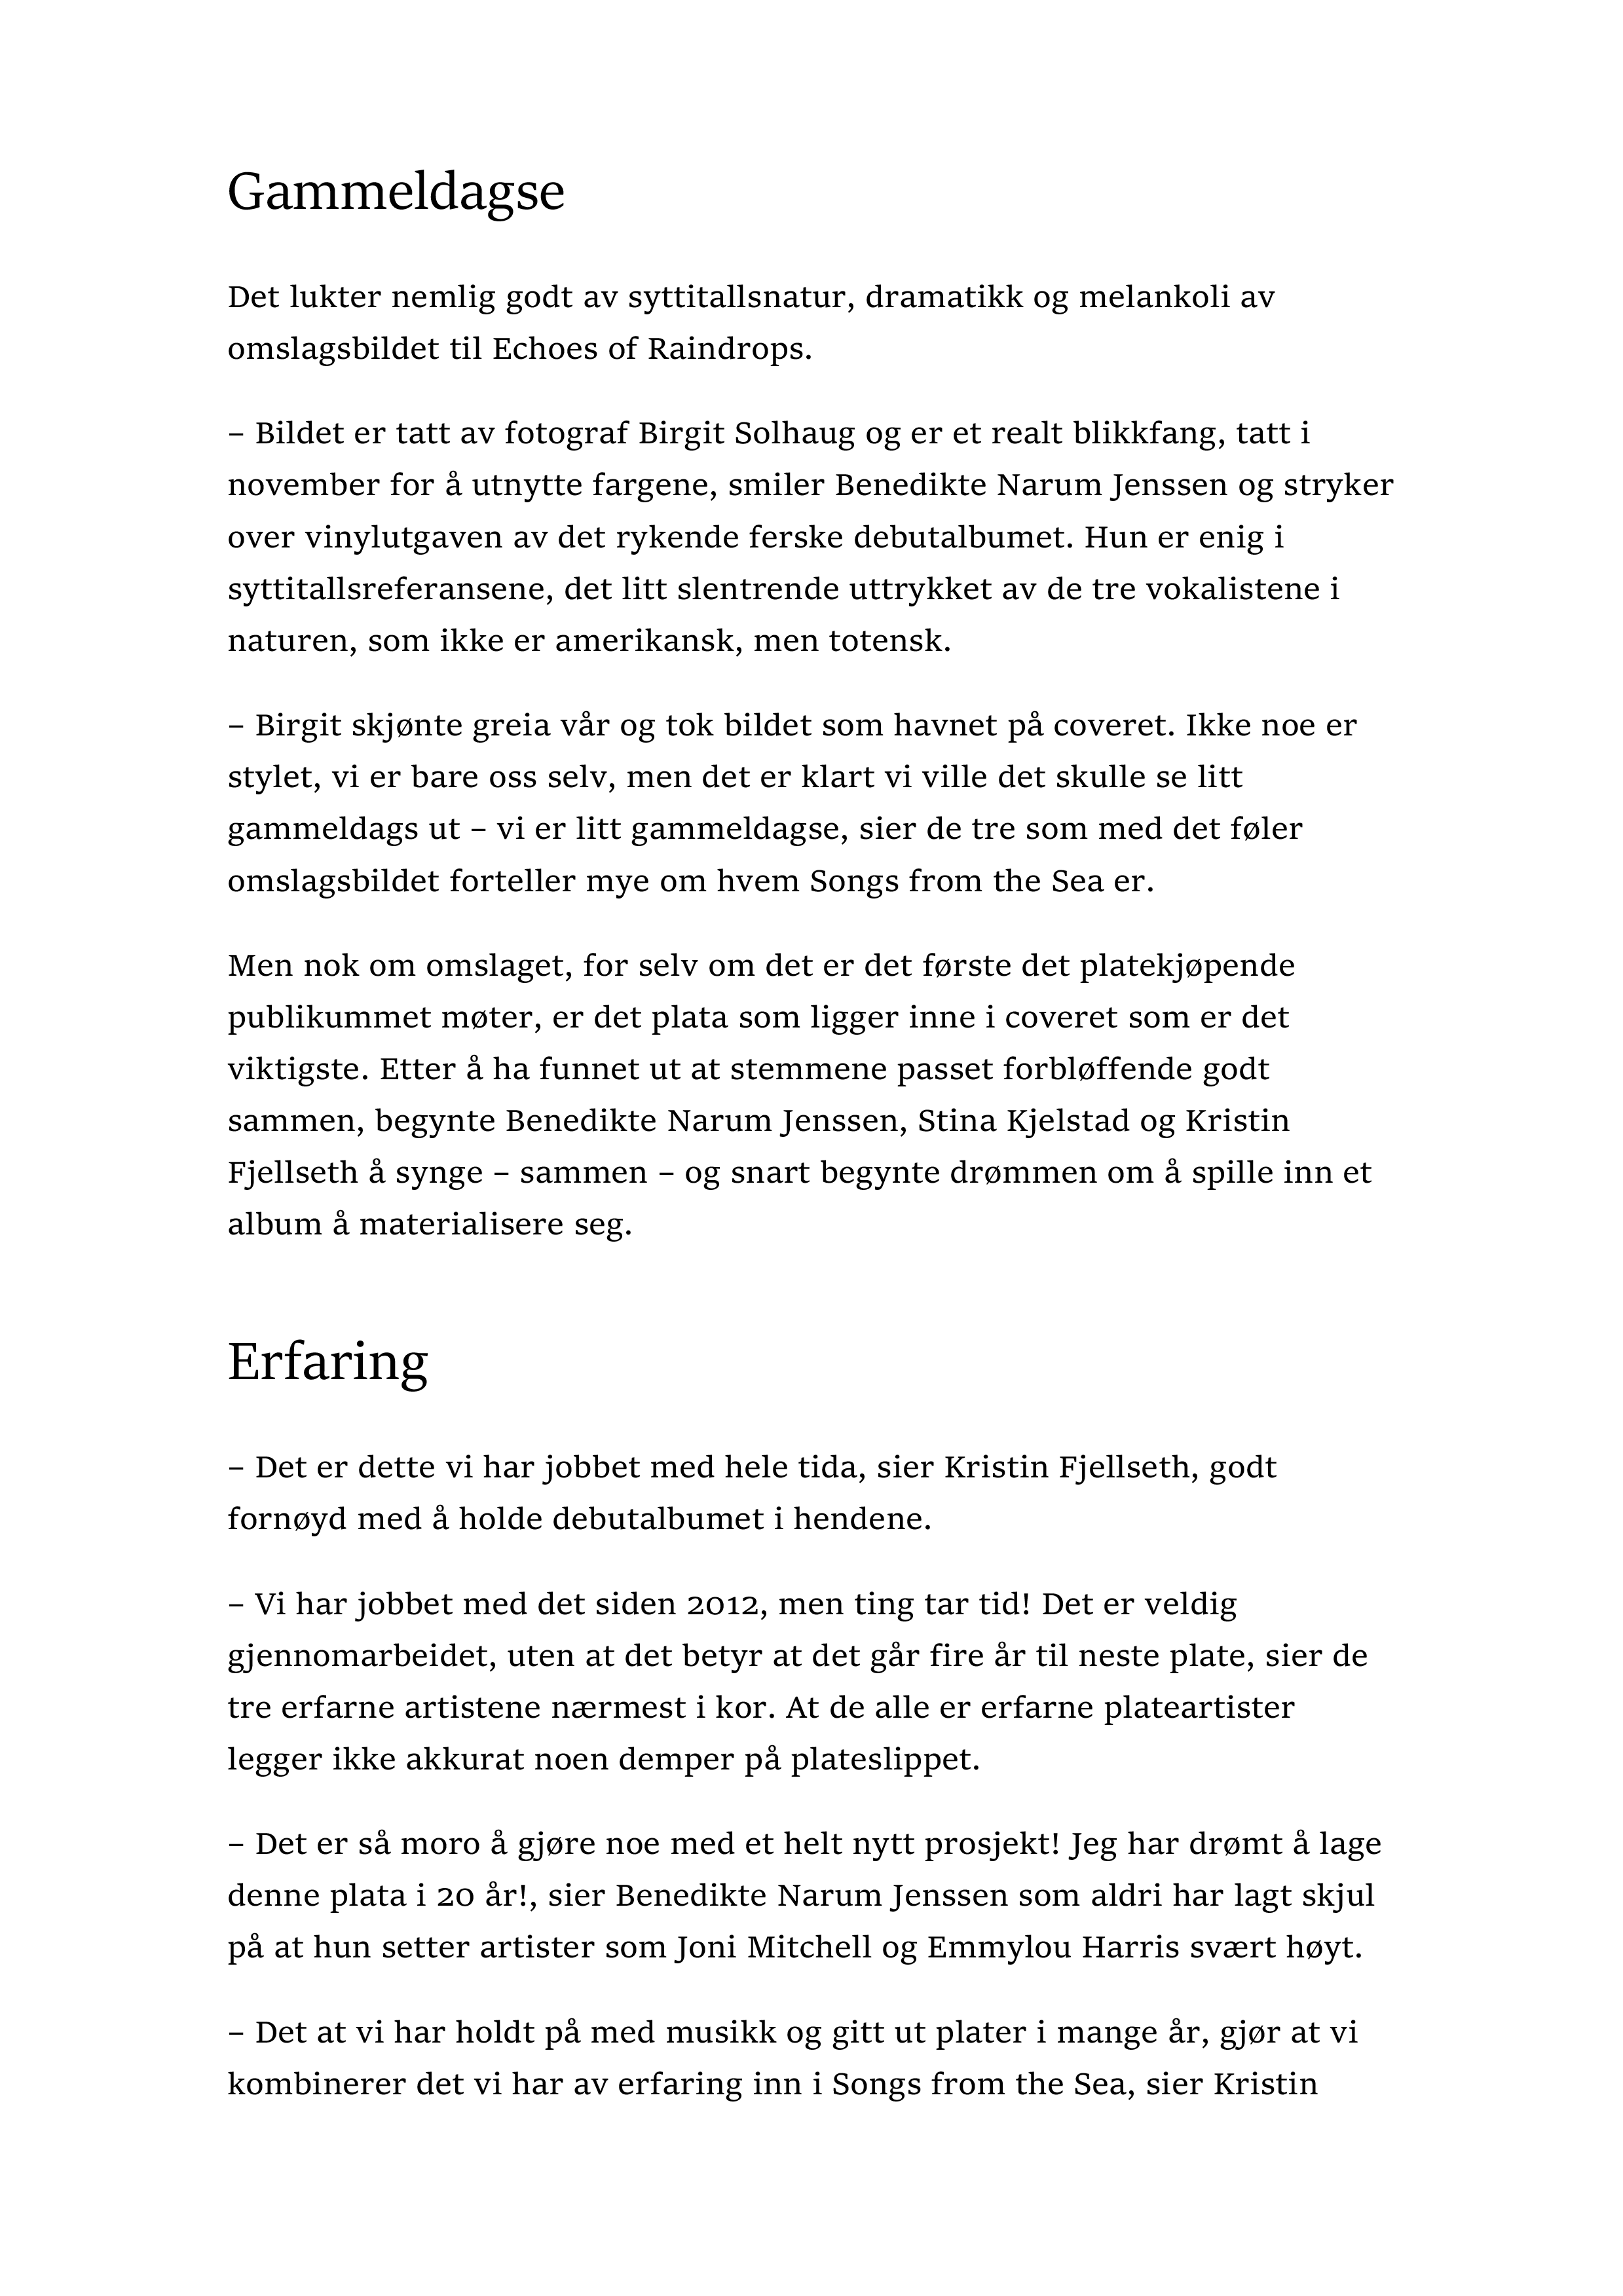 oa intervju-2.png